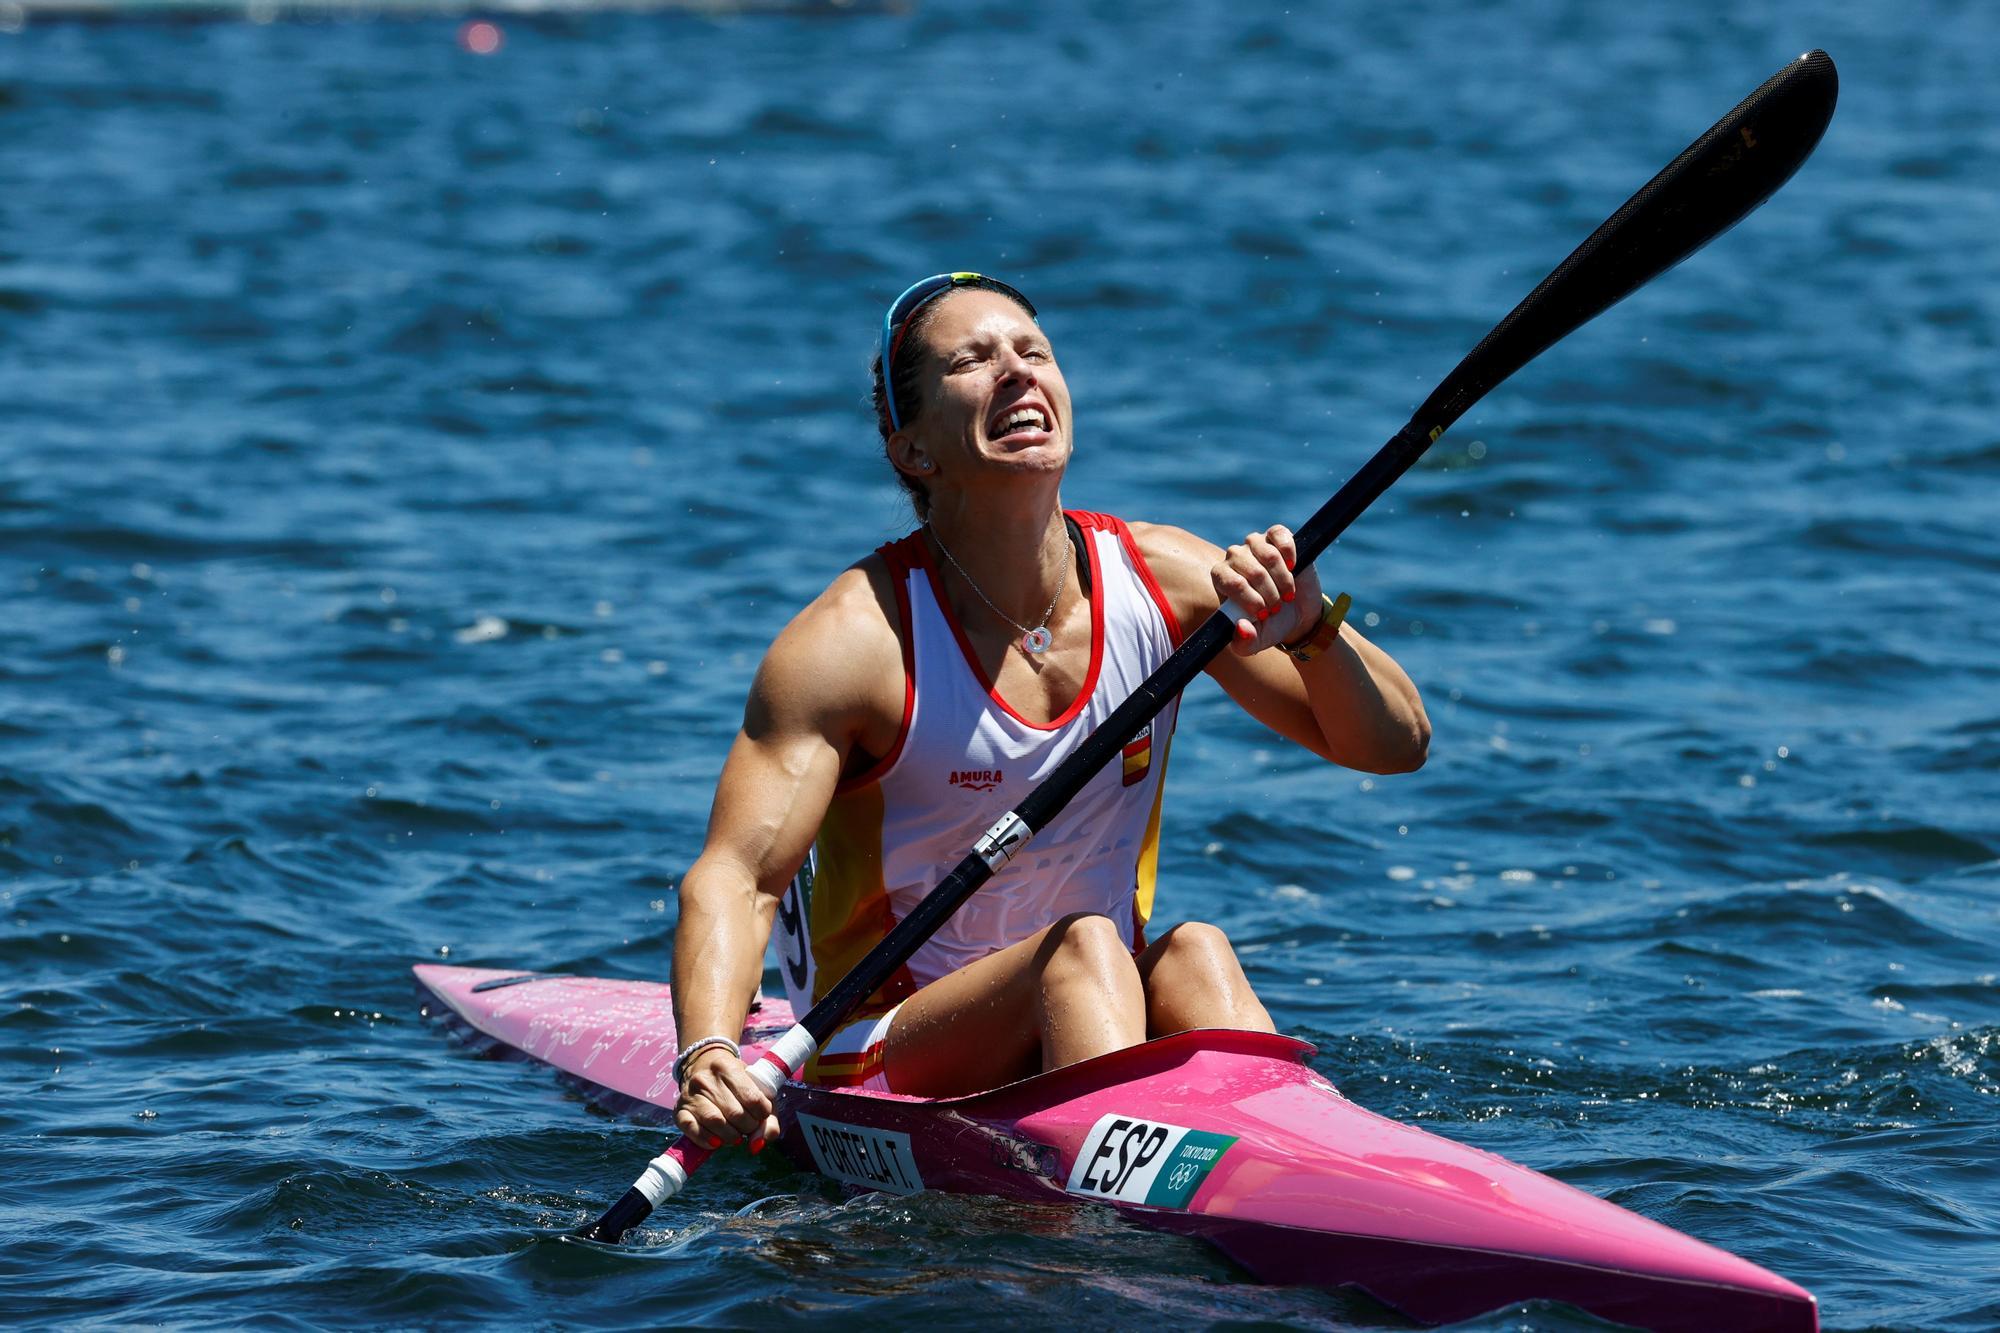 A la sexta fue la vencida: Teresa Portela, plata en Tokio